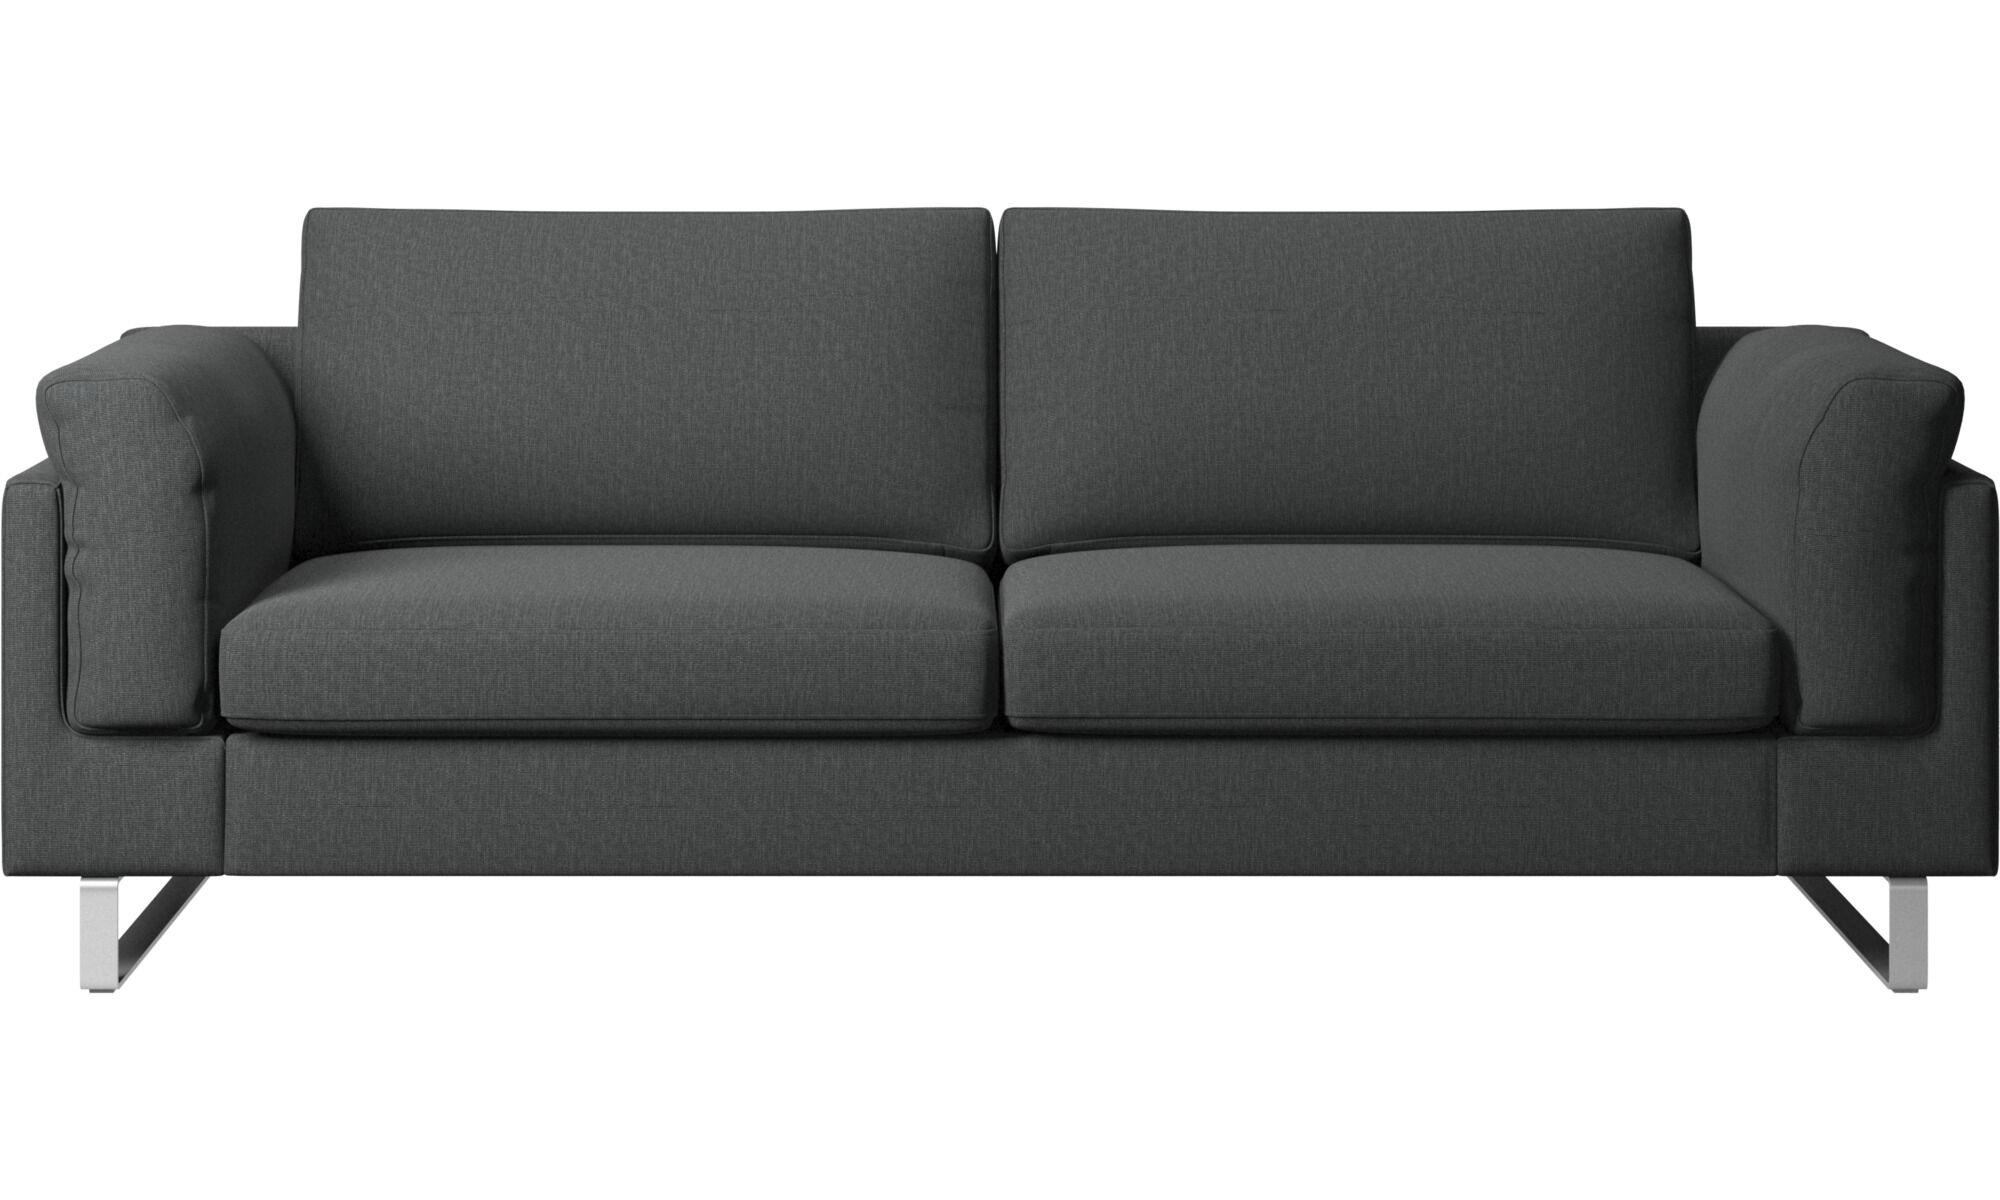 2½ Sitzer Sofas   Indivi 2 Sofa   Grau   Stoff ...